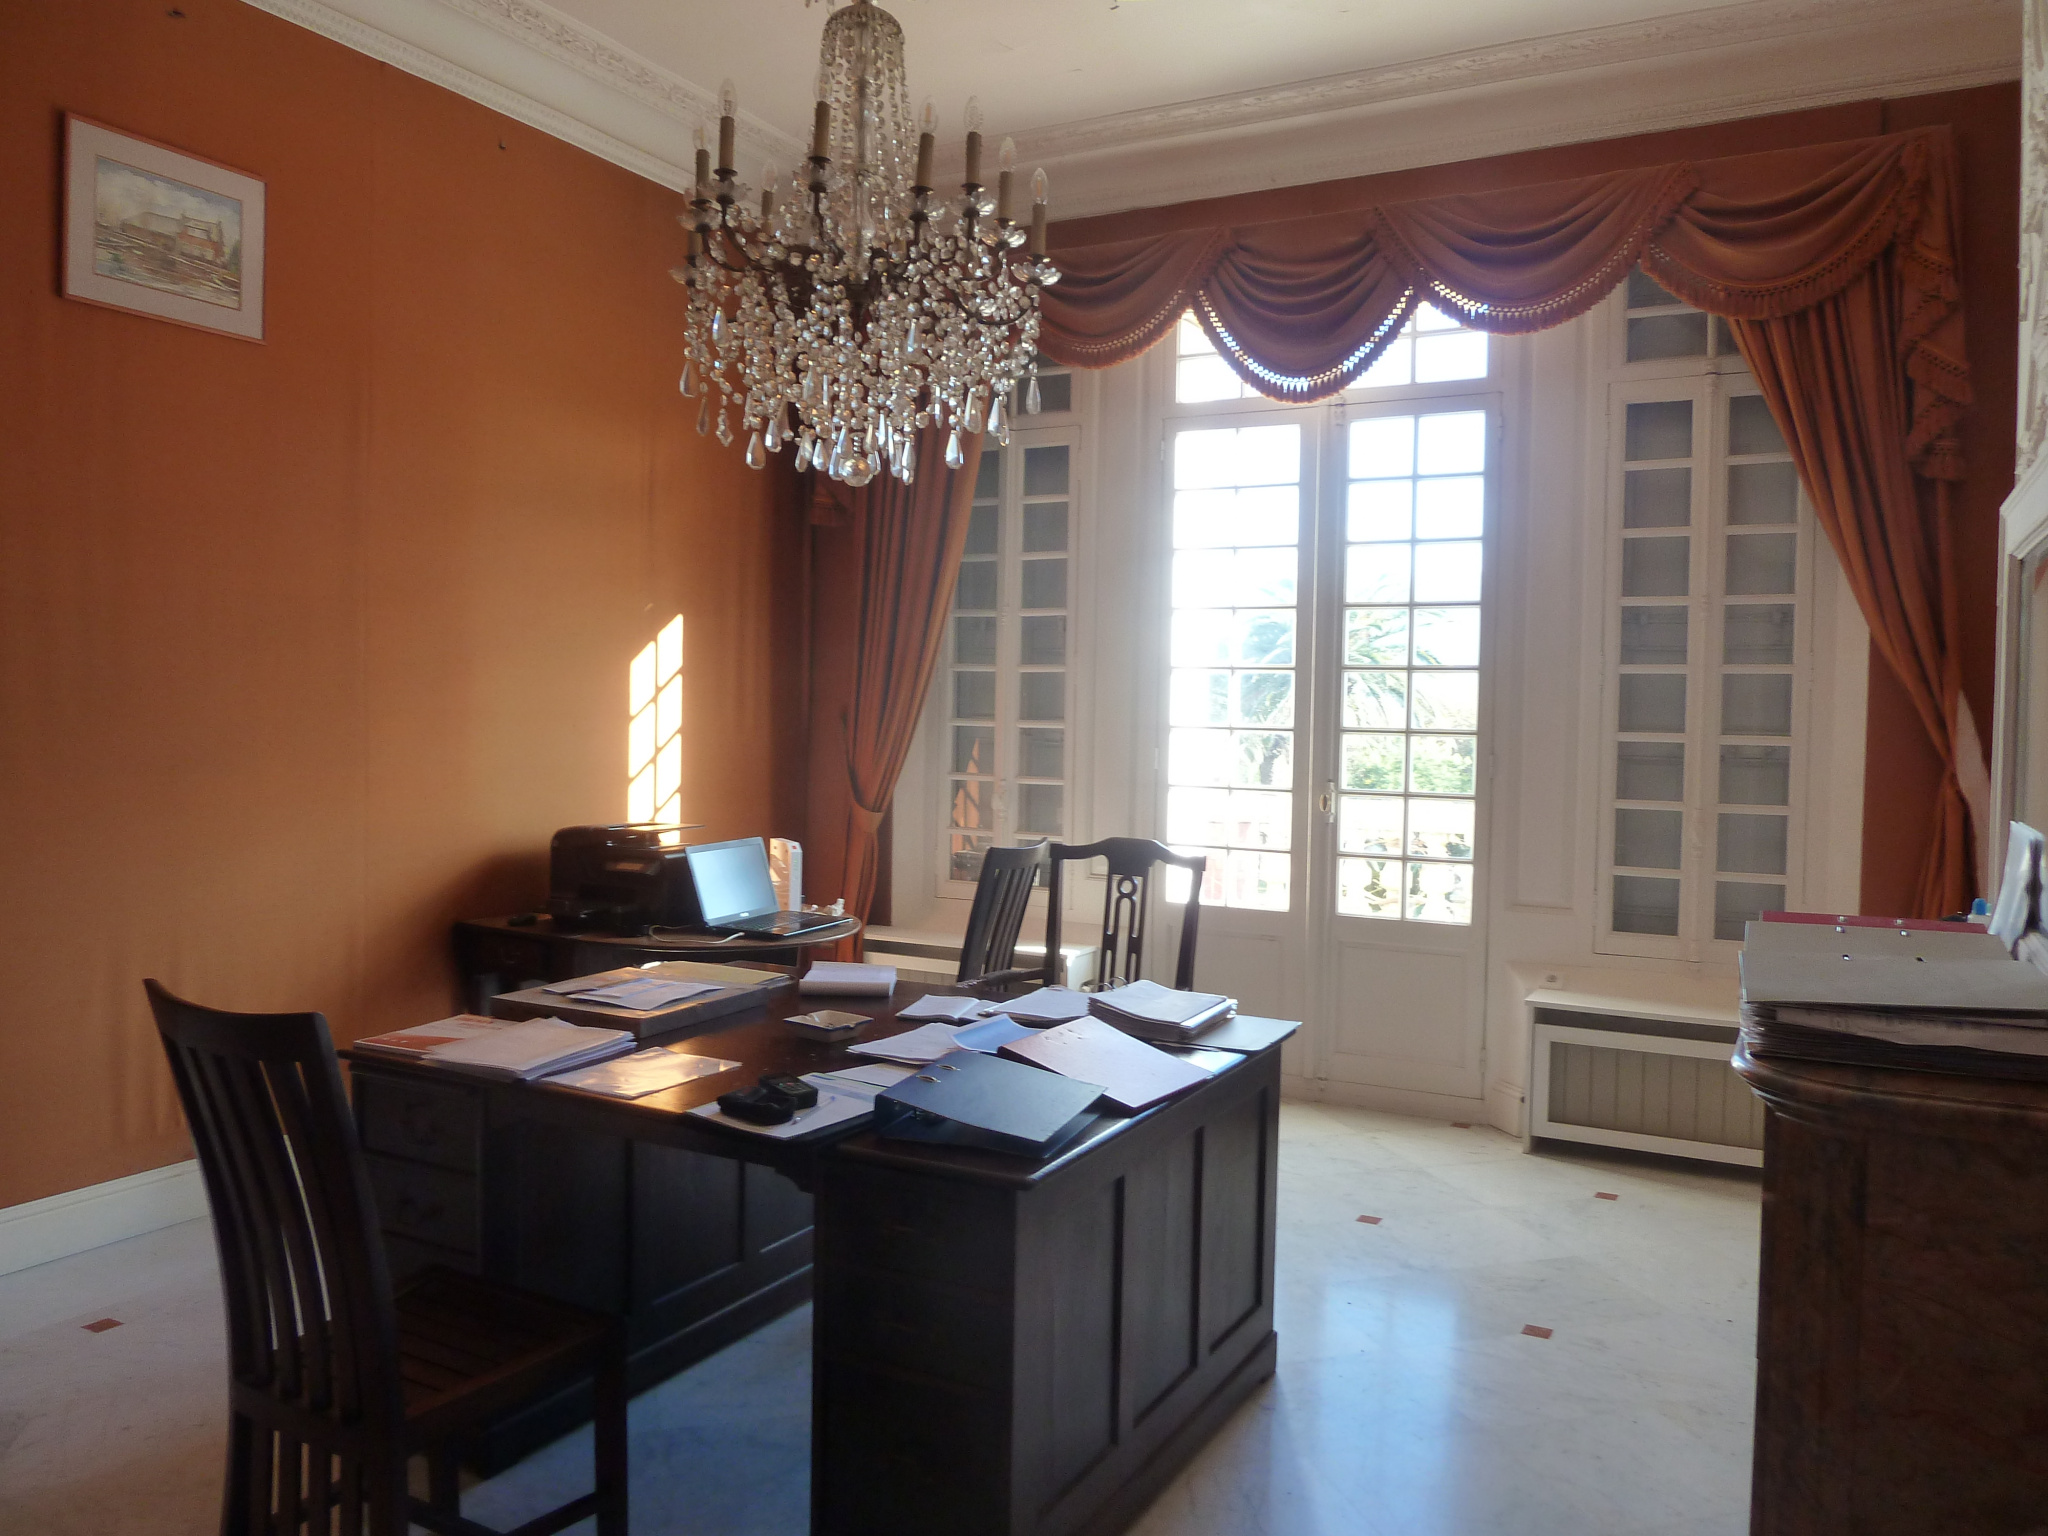 À vendre chateau de 760m2 à brouilla (66620) - Photo 20'